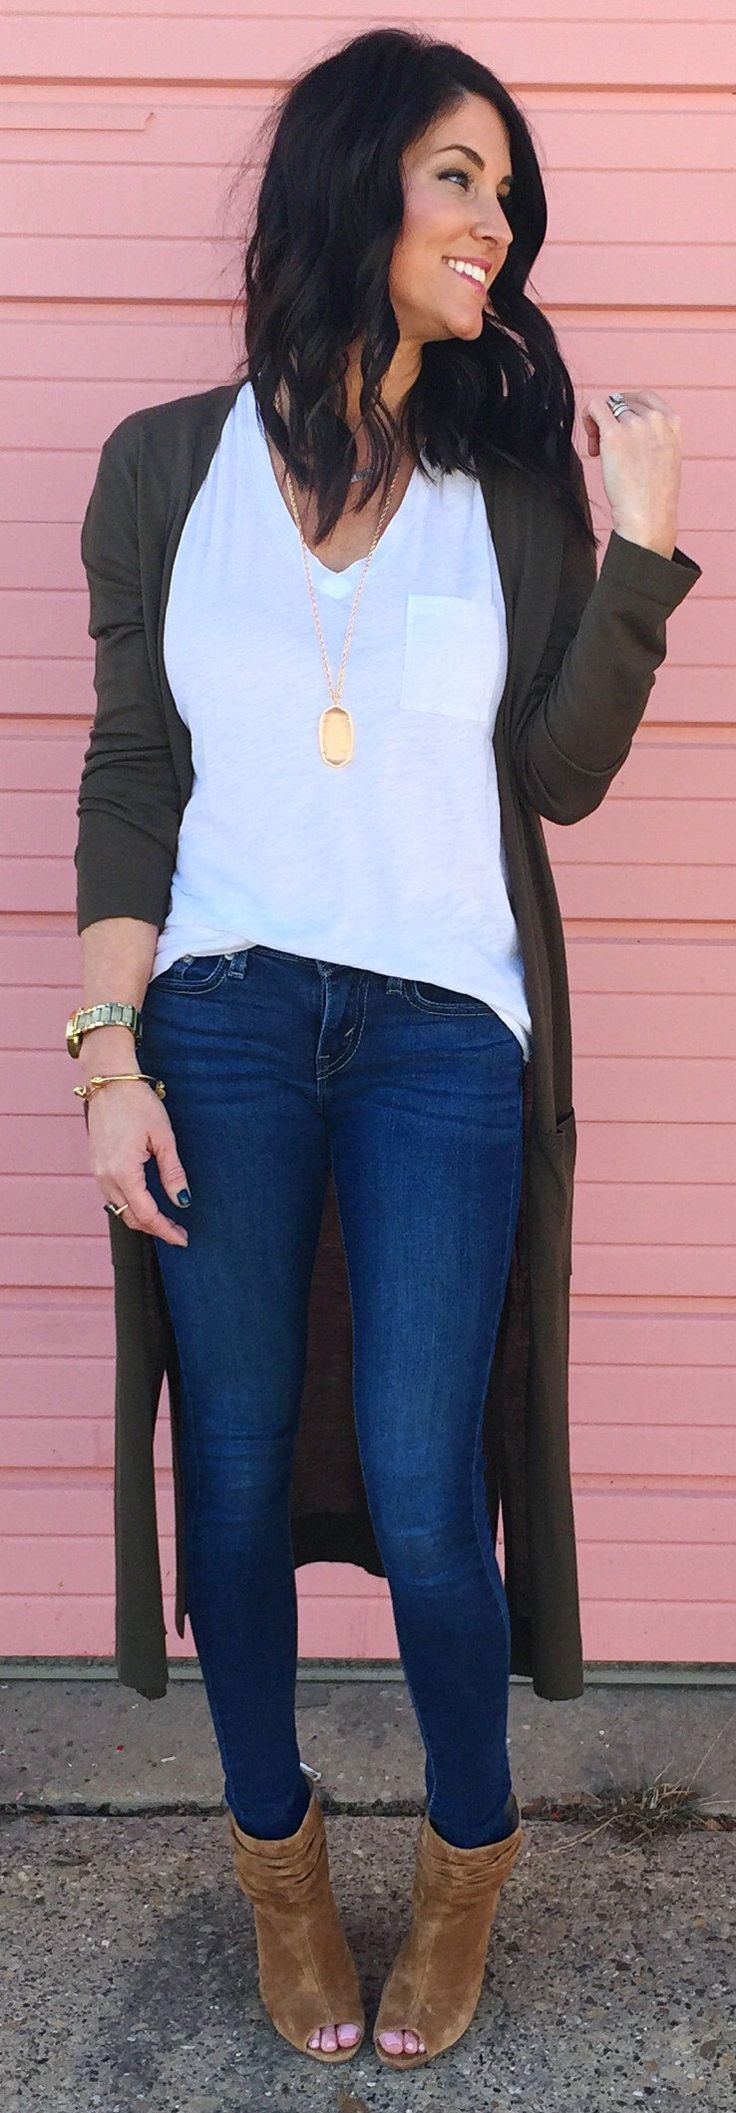 #winter #fashion /  Dark Maxi Cardigan / Navy Skinny Jeans / White Tee / Brown Open Toe Booties